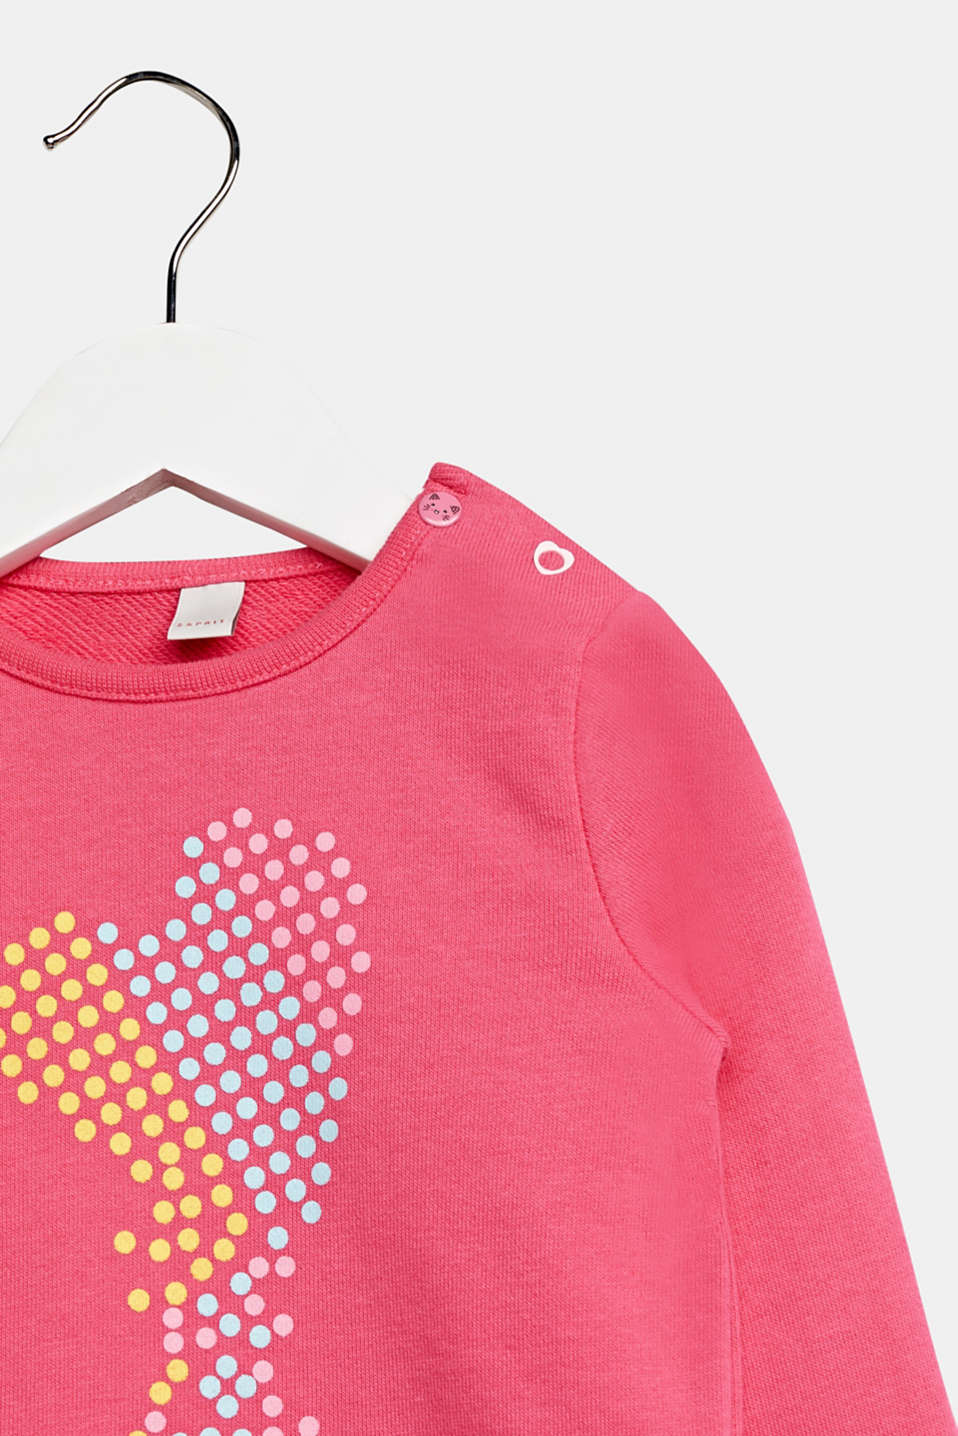 Heart print sweatshirt, 100% cotton, LCCANDY PINK, detail image number 2